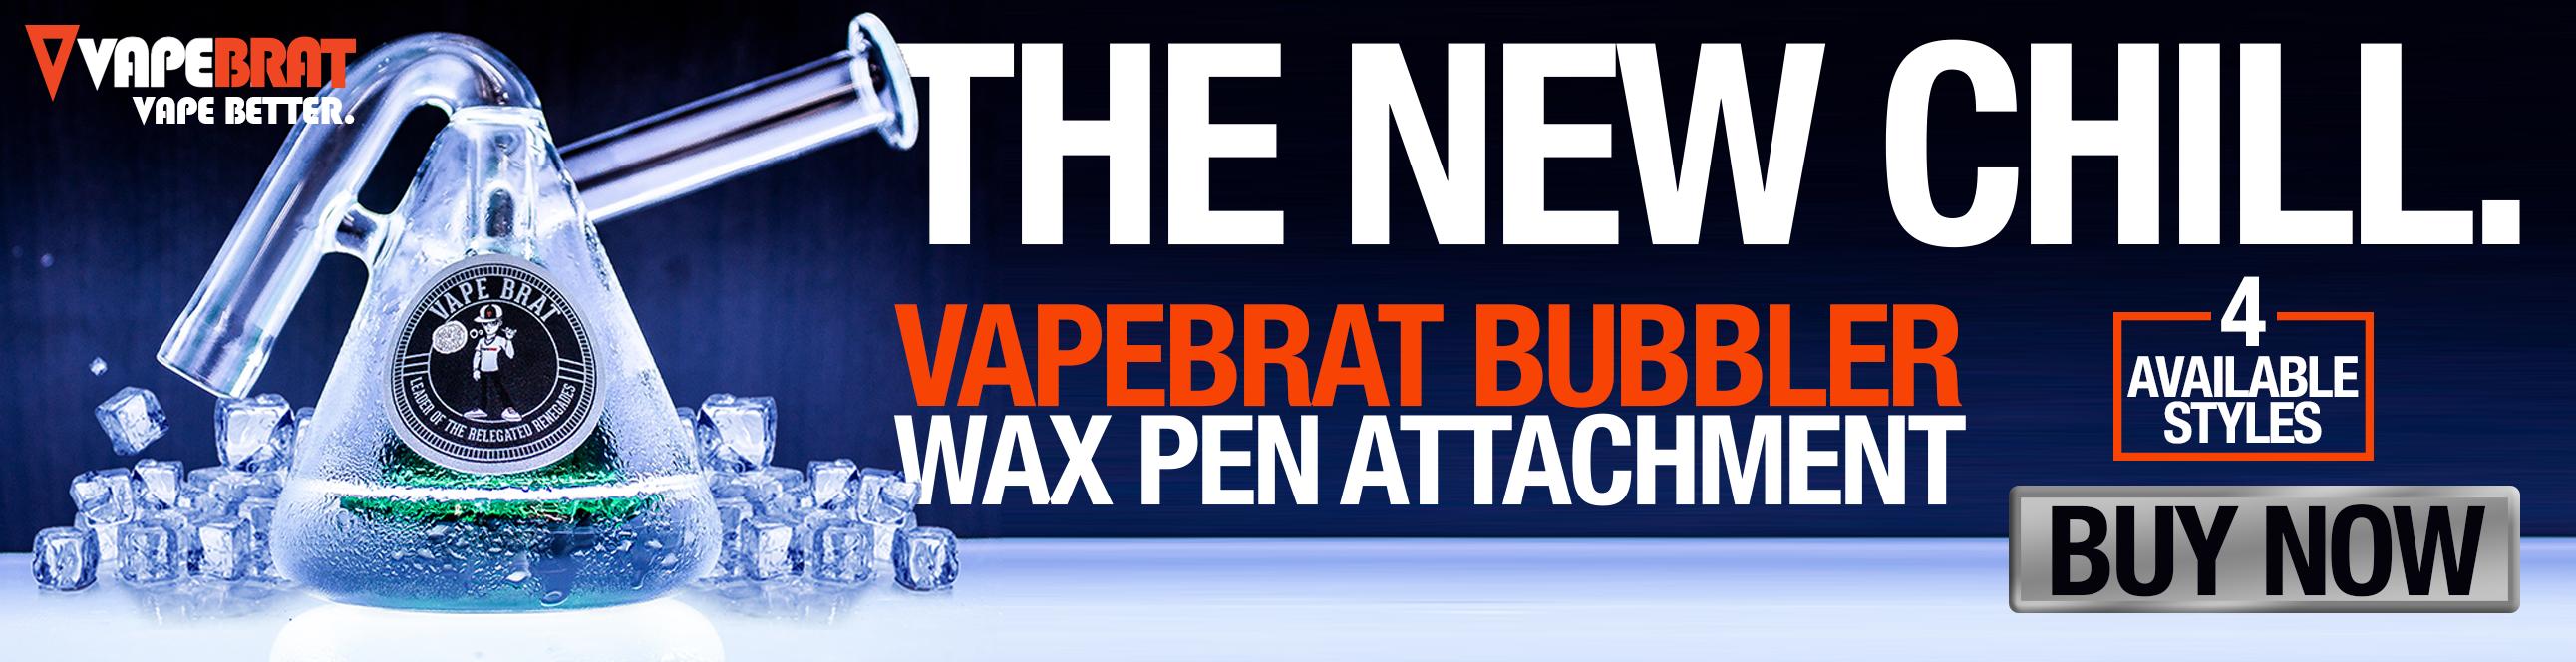 vapebrat-bubbler-banner1.png